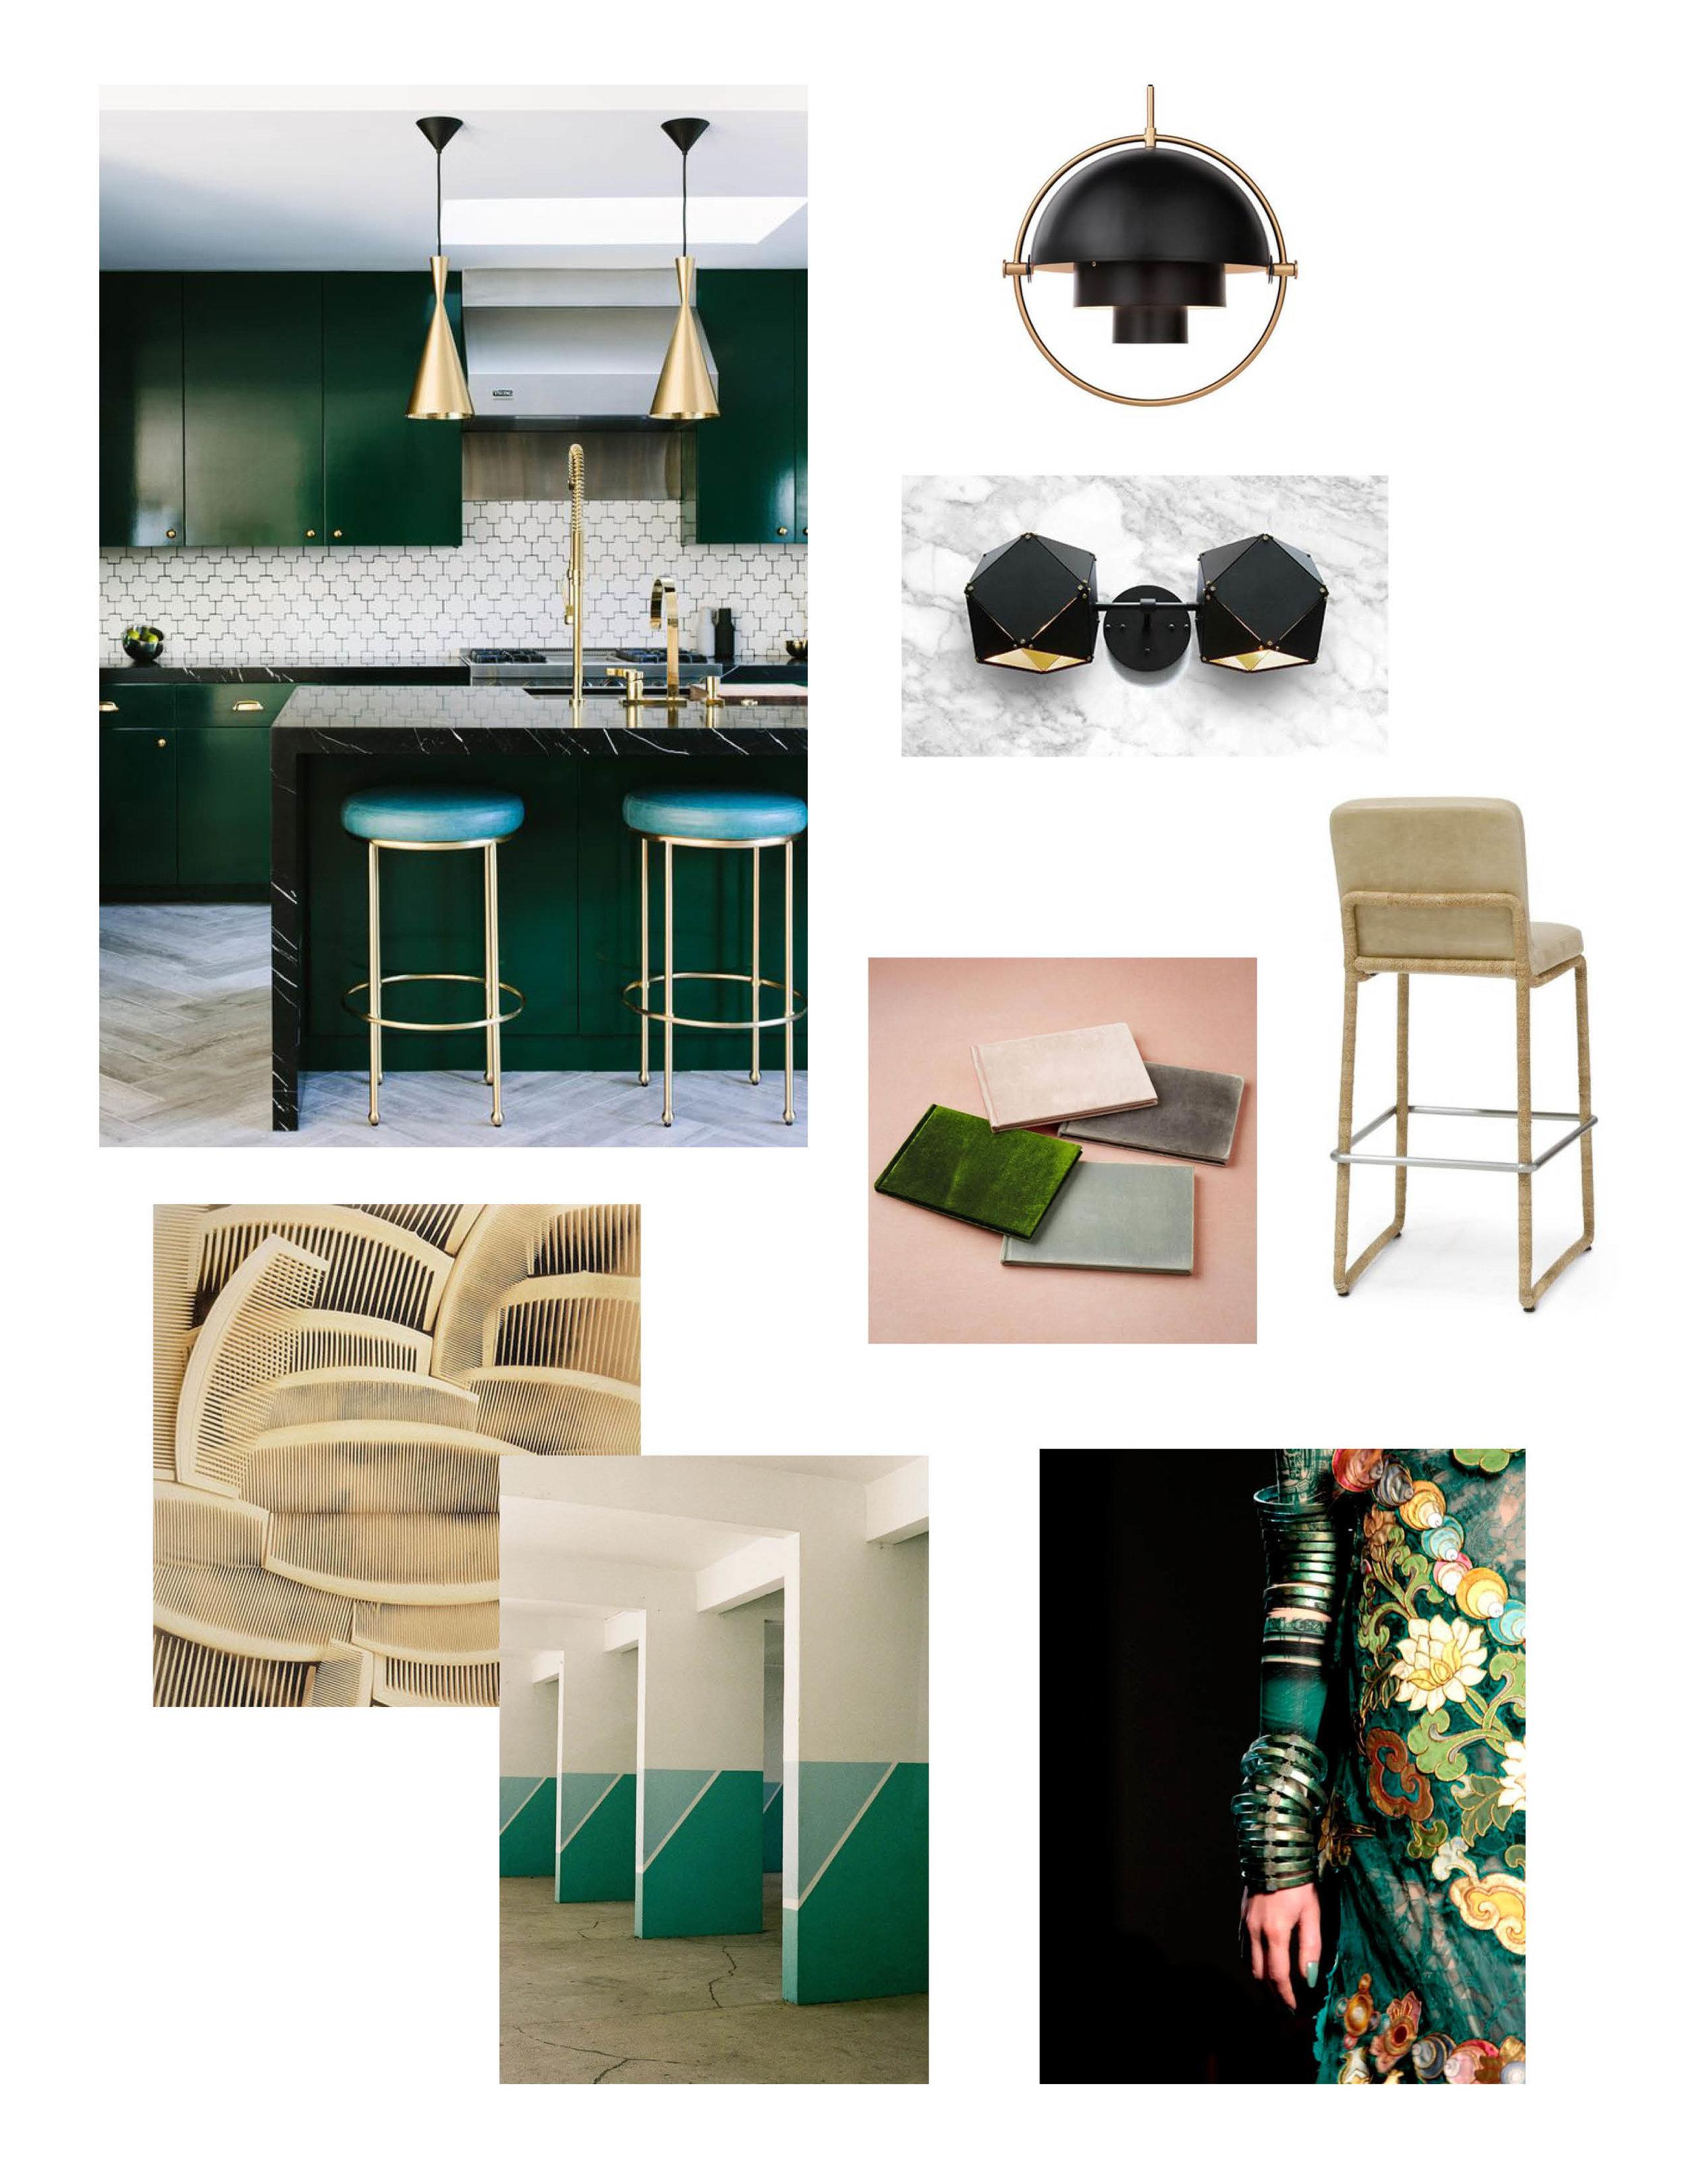 Kitchen+Mood+Board+1.jpg